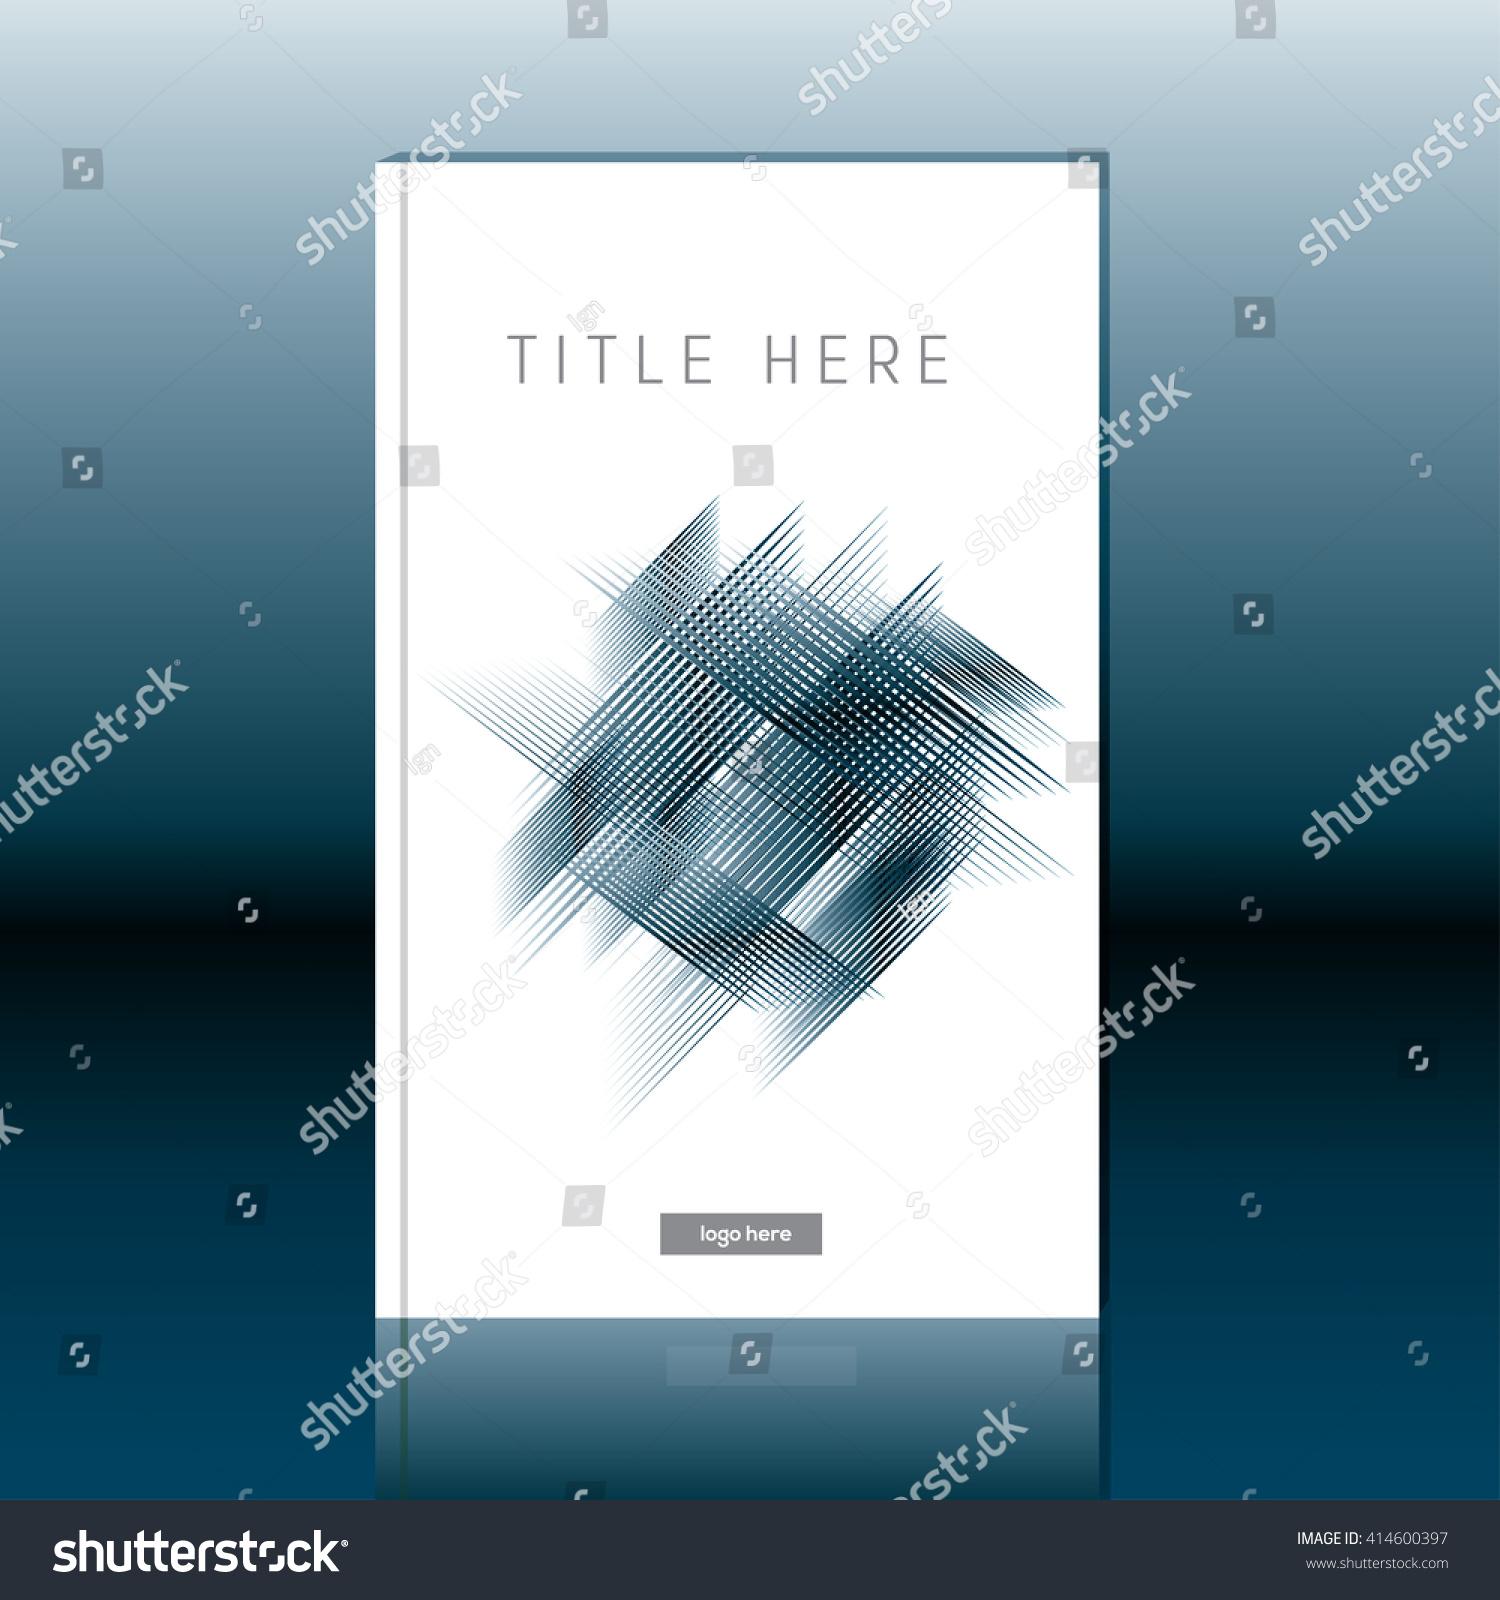 Book Cover Design Abstract : Abstract book cover design brochure report stock vector